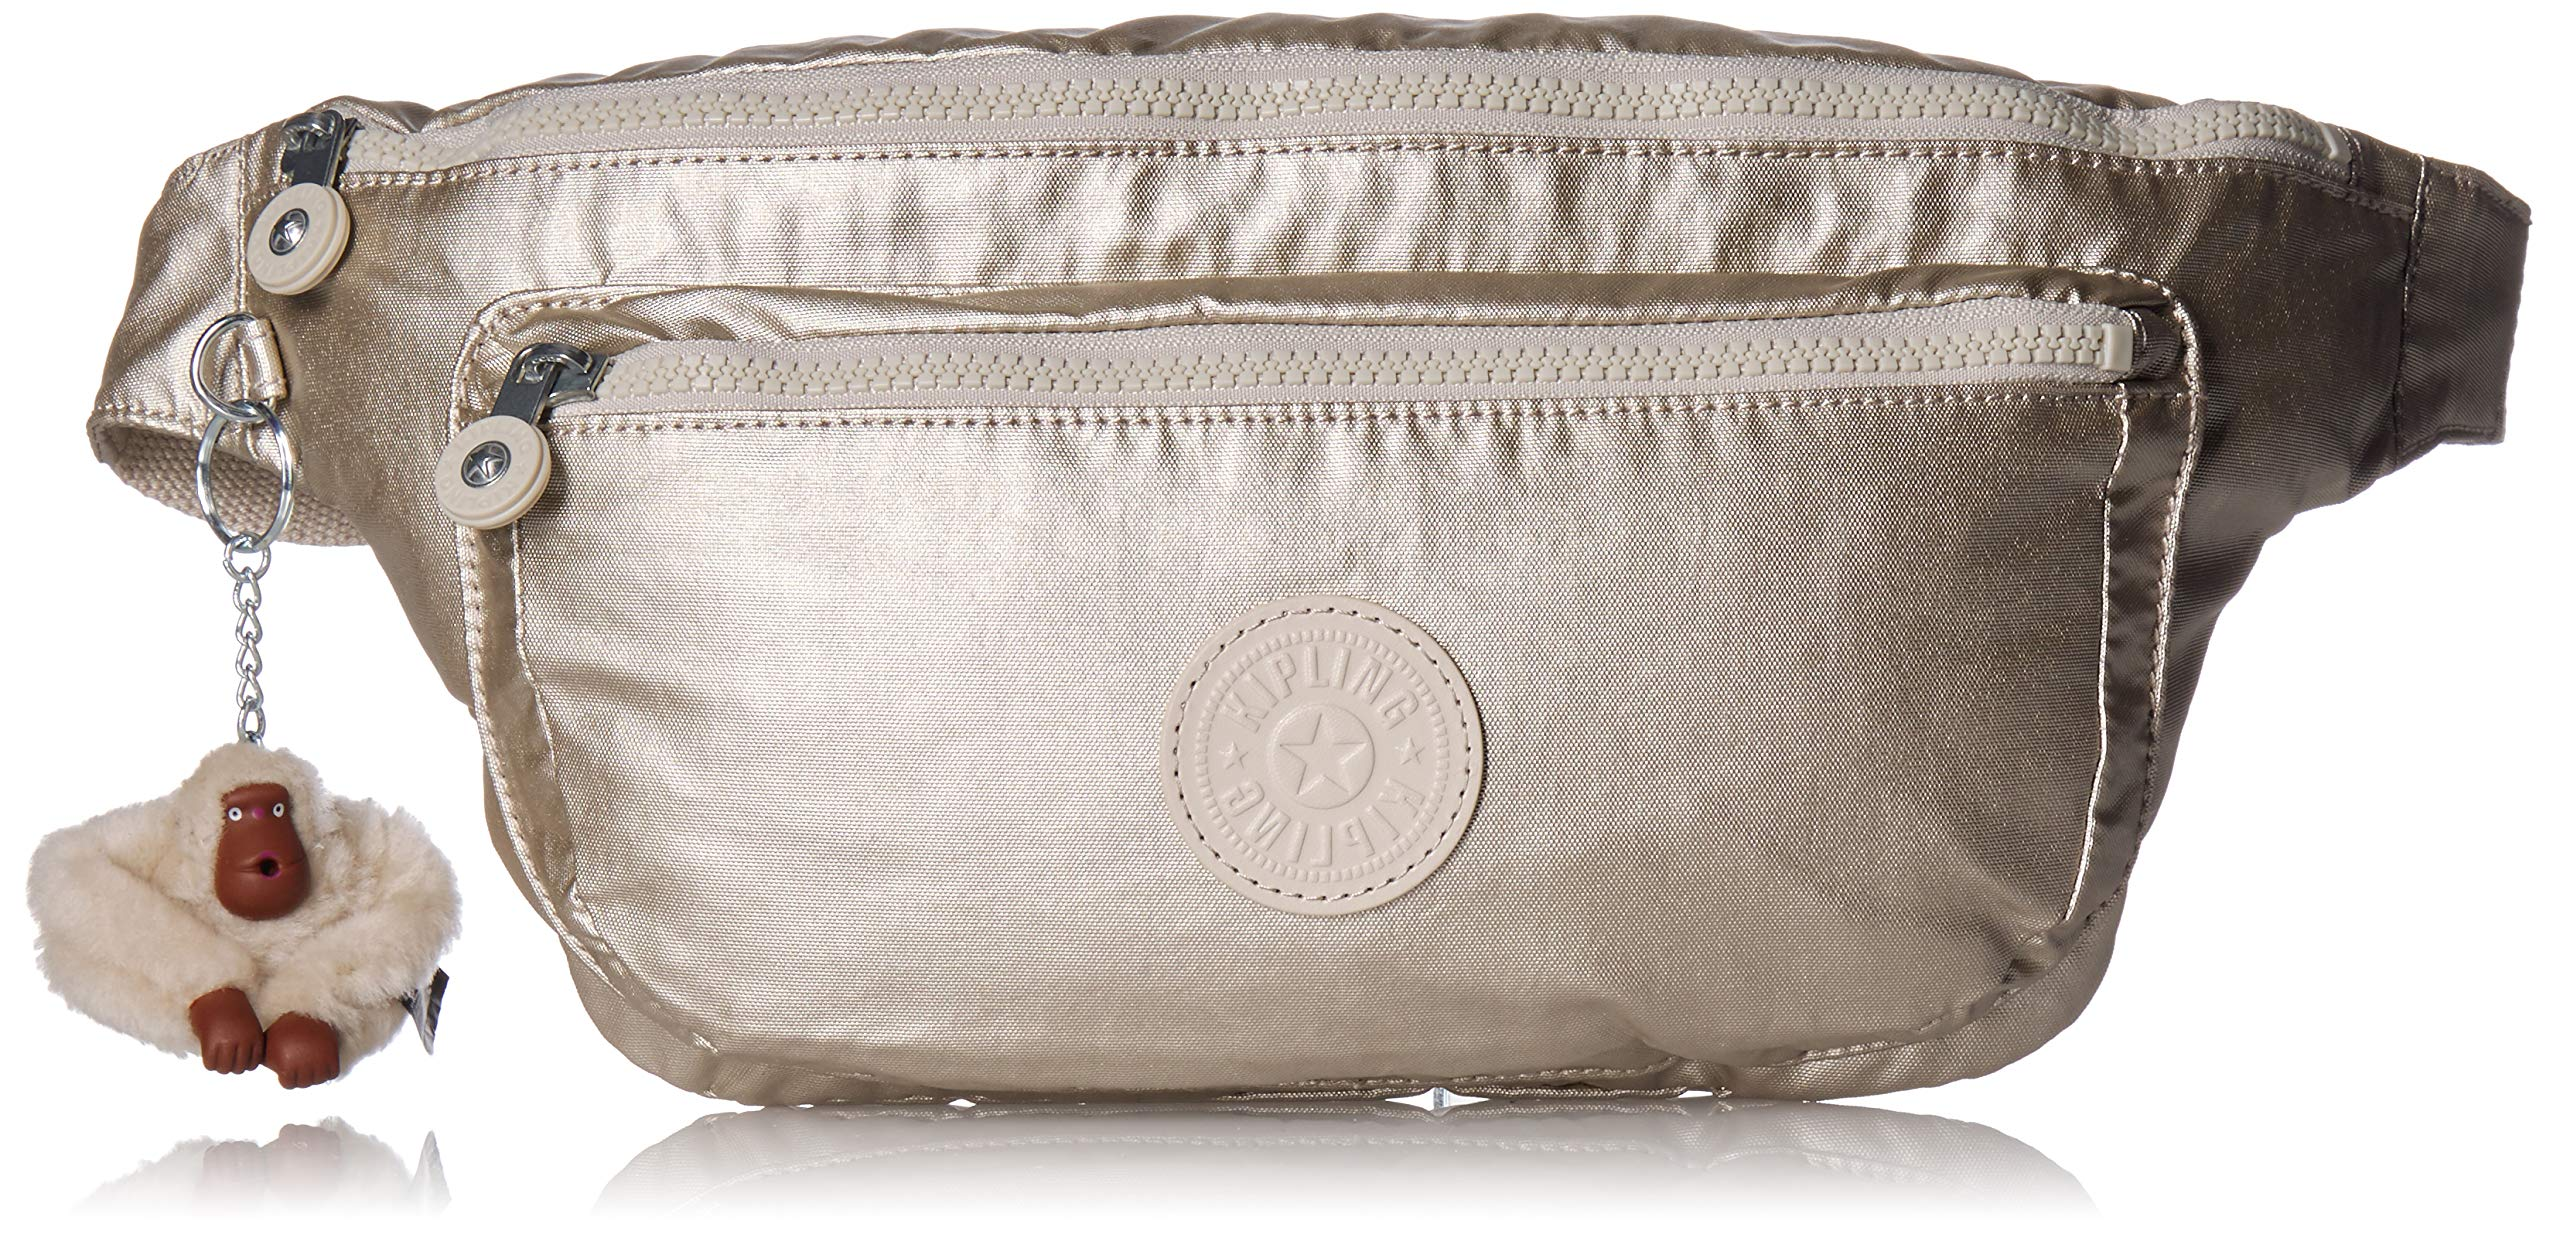 Kipling Yasemina XL Waistpack, Adjustable, Multipocket, Zip Closure, cloud Grey/Metallic by Kipling